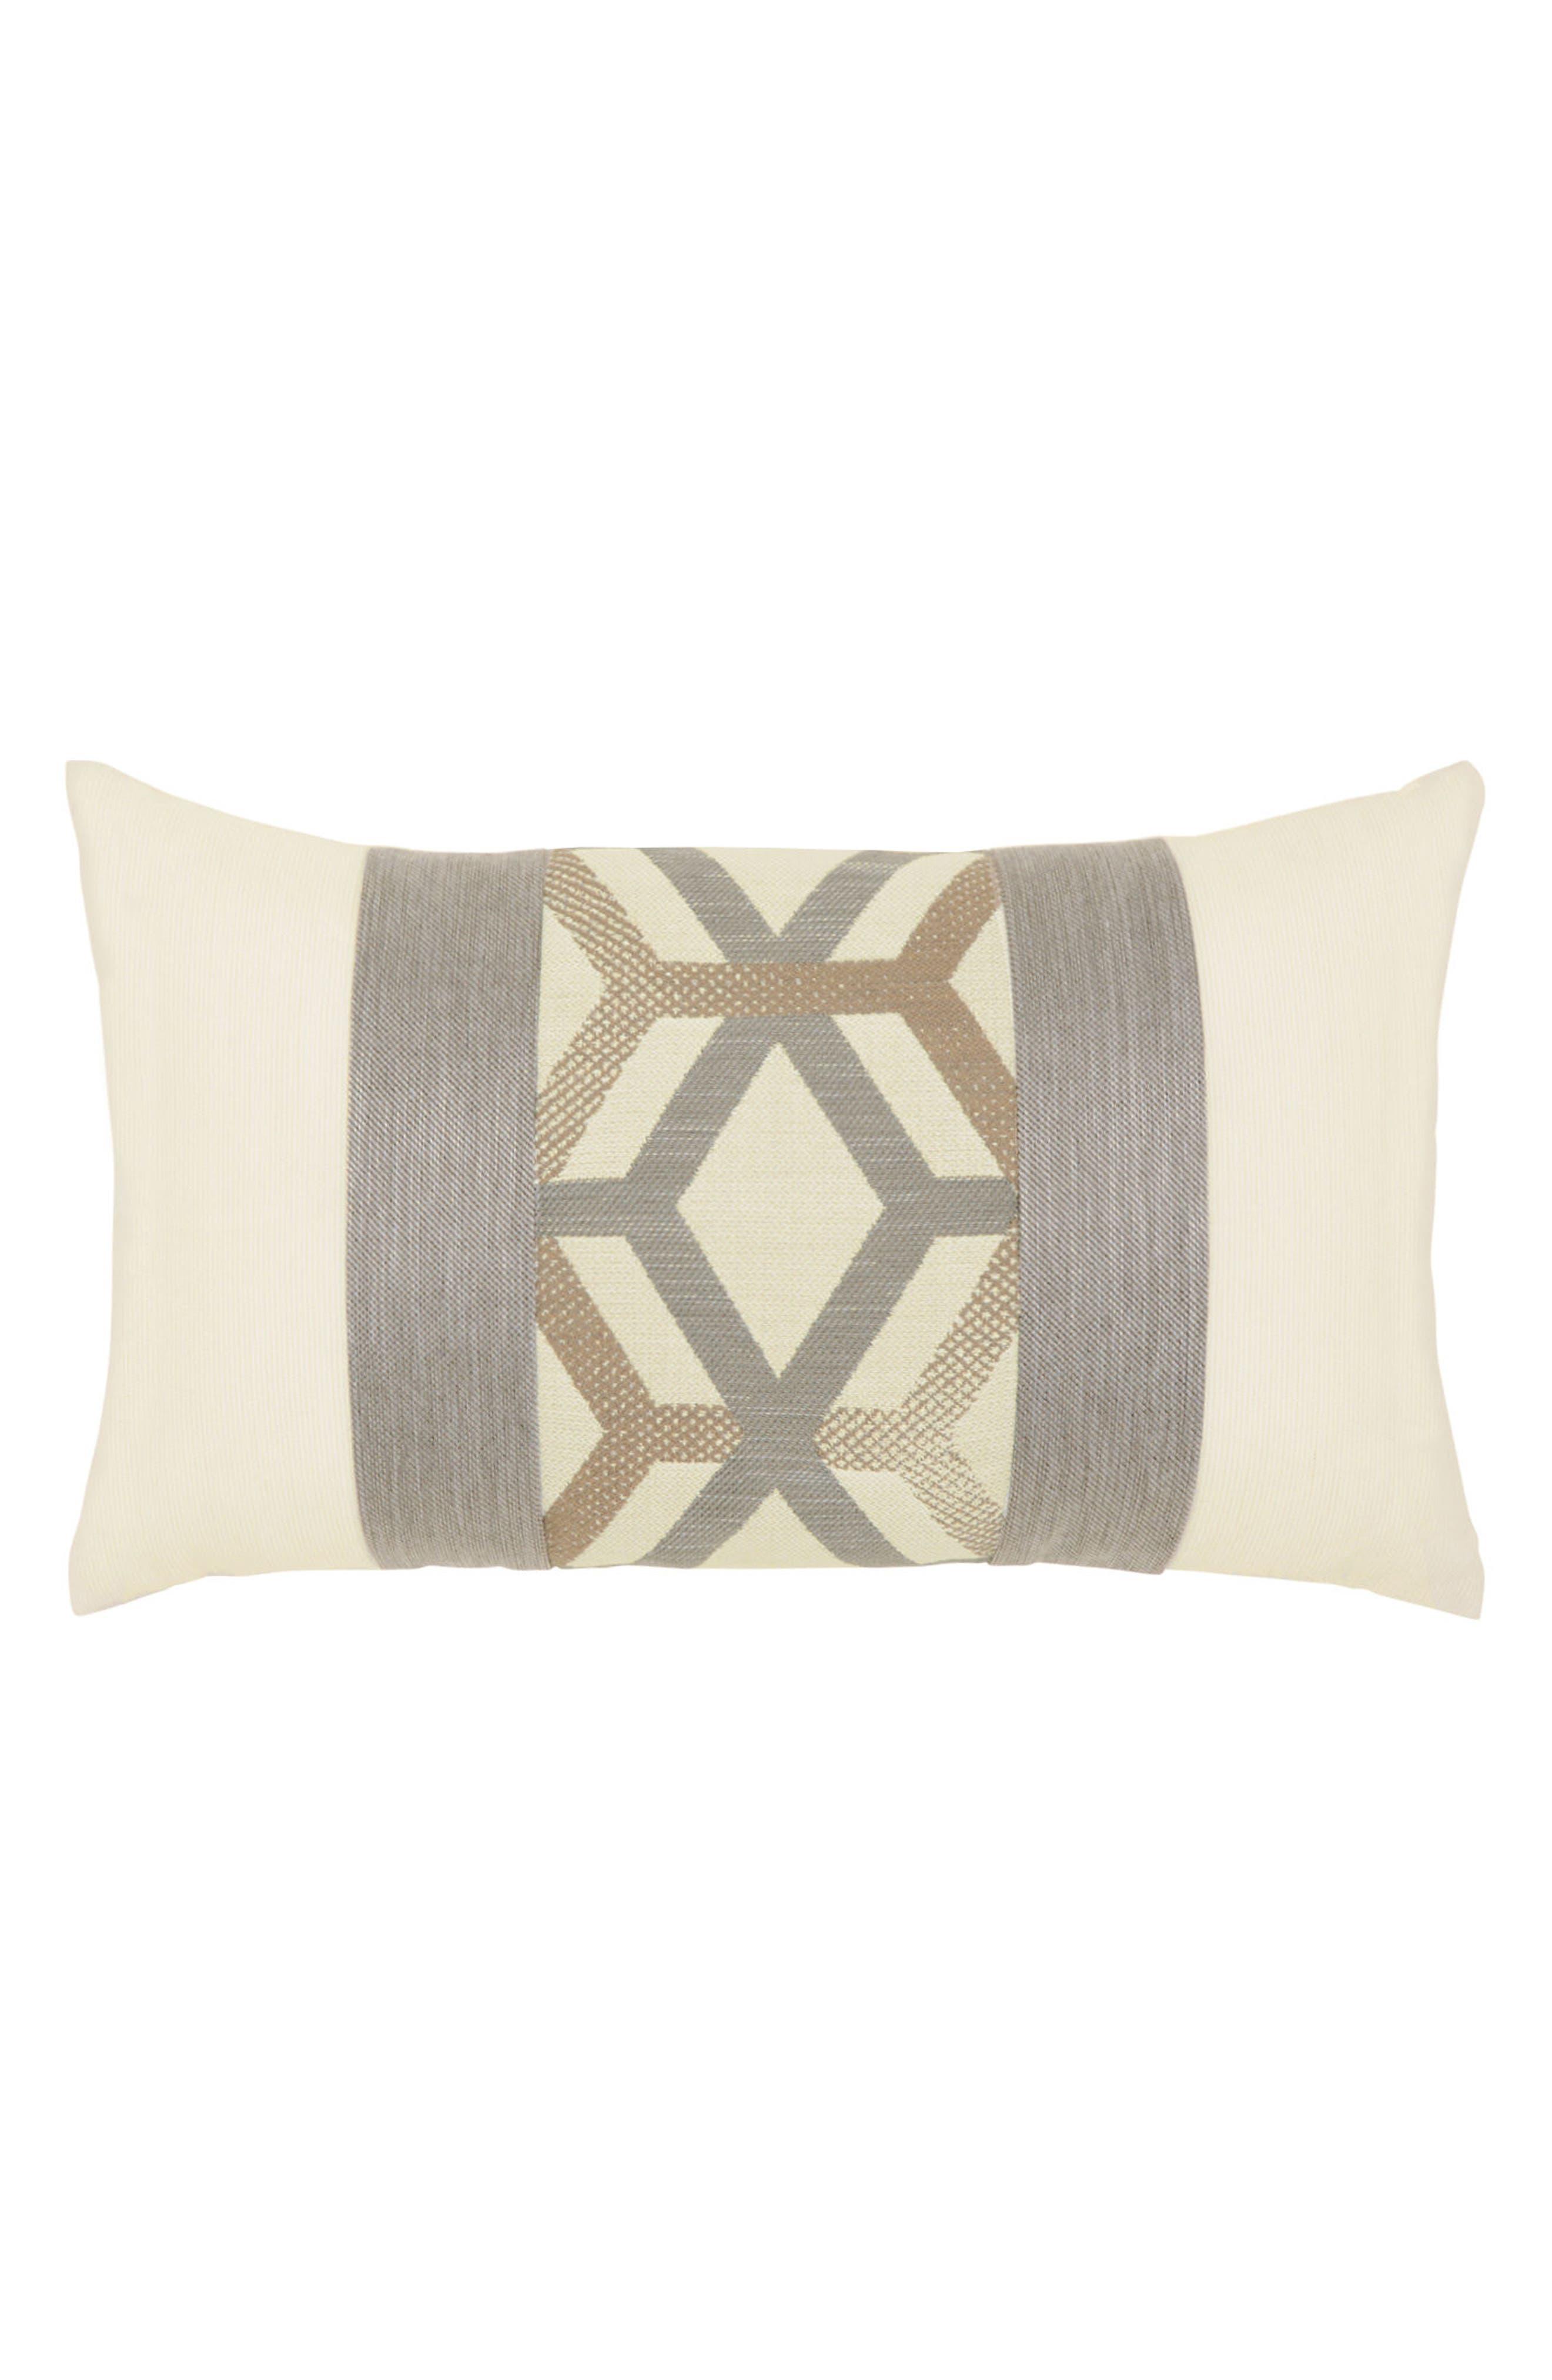 Lustrous Lines Lumbar Pillow,                         Main,                         color, IVORY/ GREY